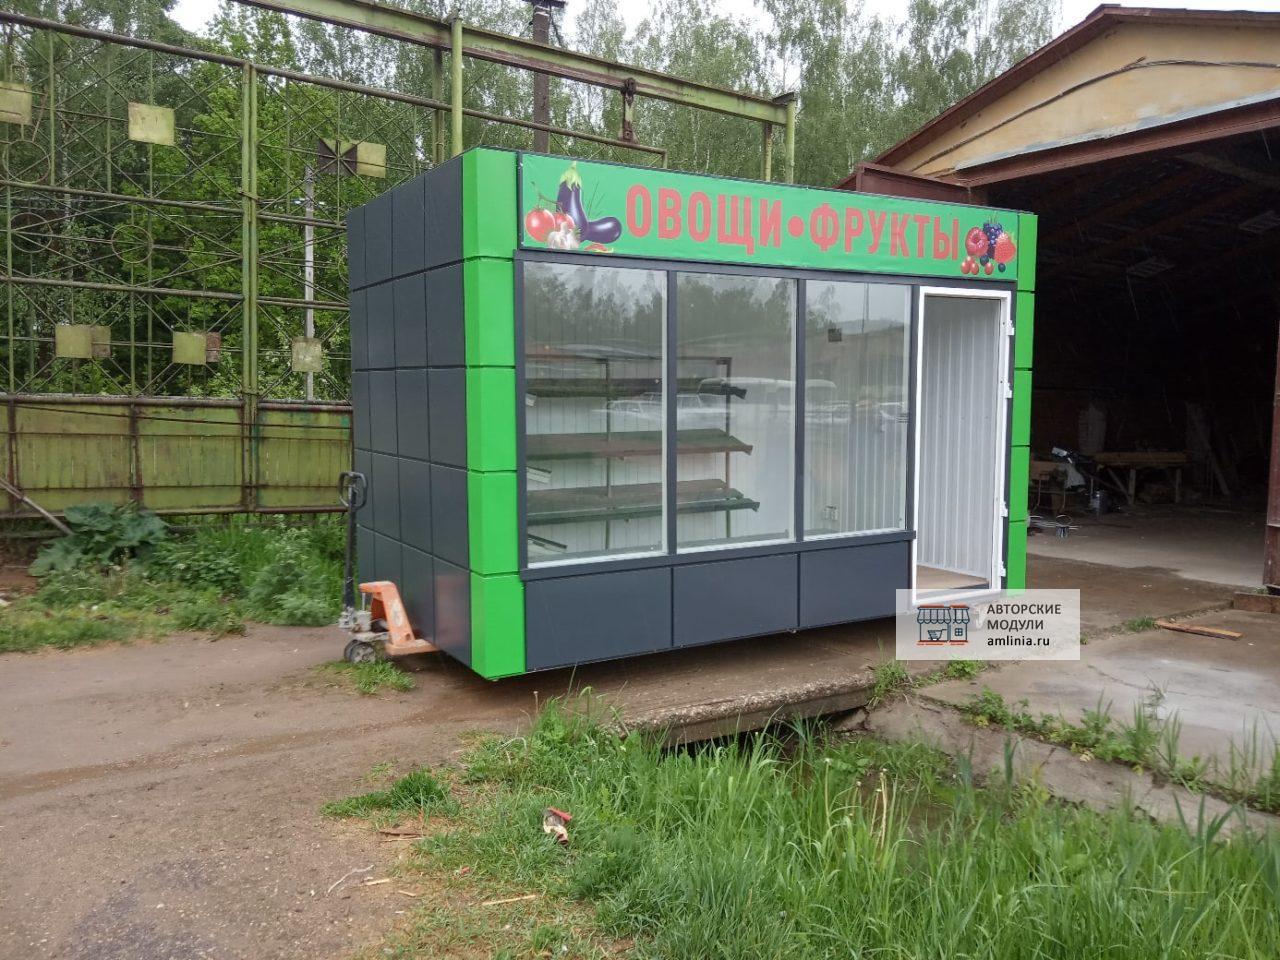 Павильон одномодульный овощной со входом, размер 2.87 х 2.49 х 4.49 метра